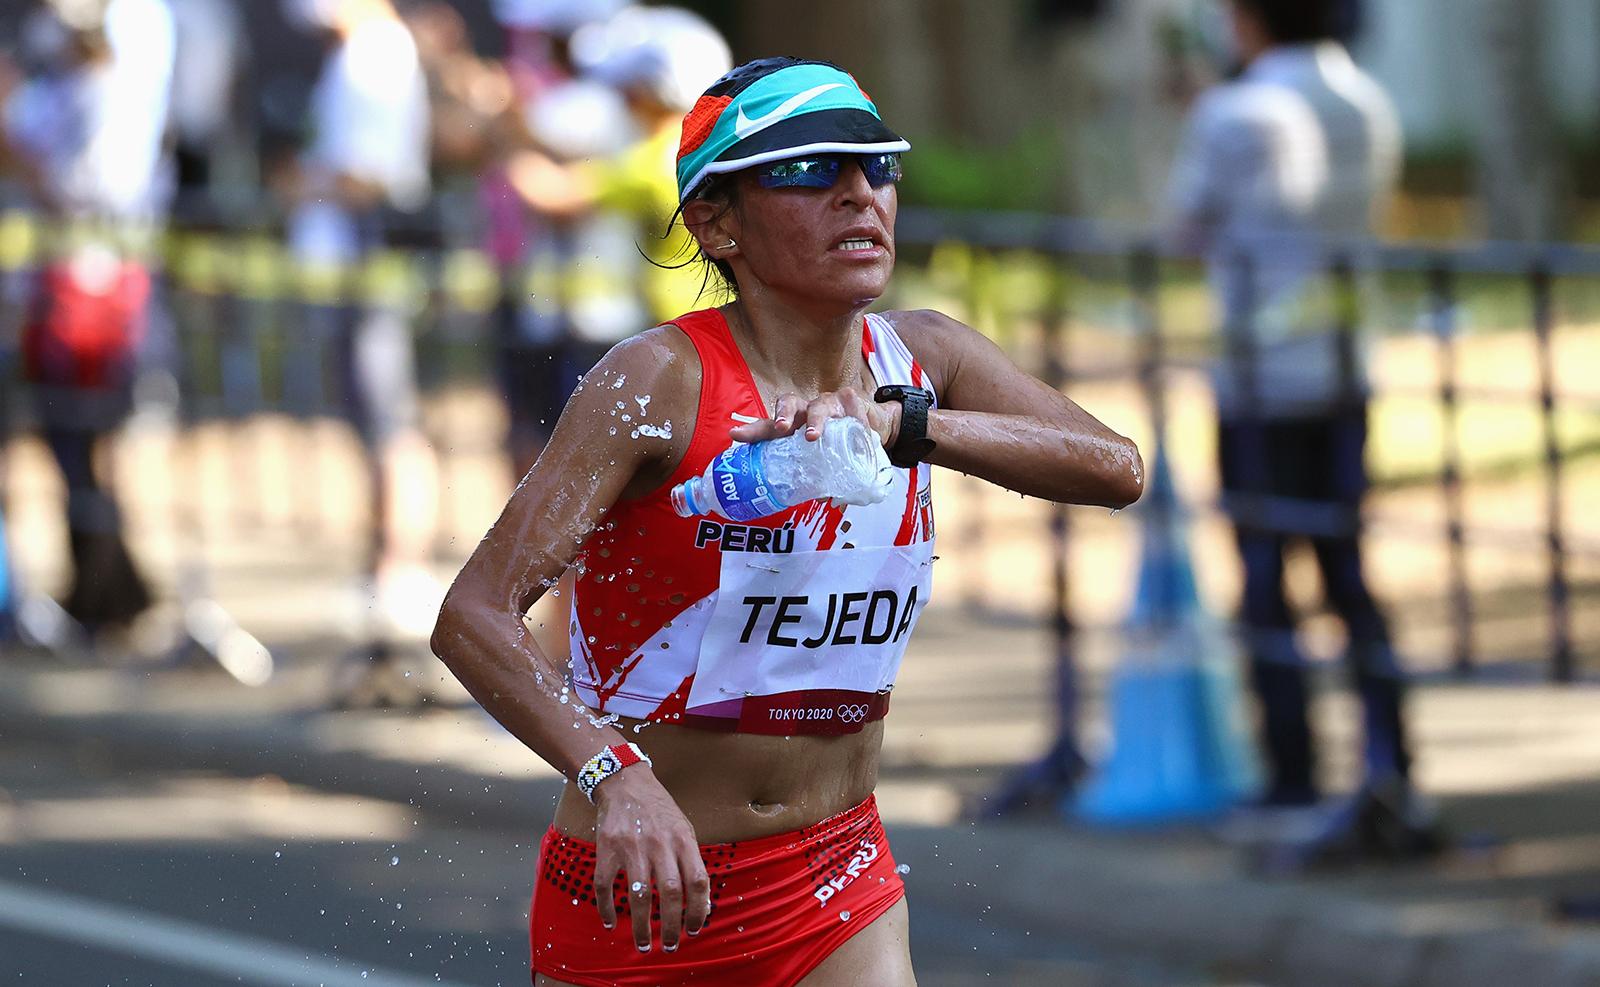 Tokyo 2020 Olympics - Athletics - Women's Marathon - Sapporo Odori Park, Sapporo, Japan - August 7, 2021. Gladys Tejeda of Peru in action. REUTERS